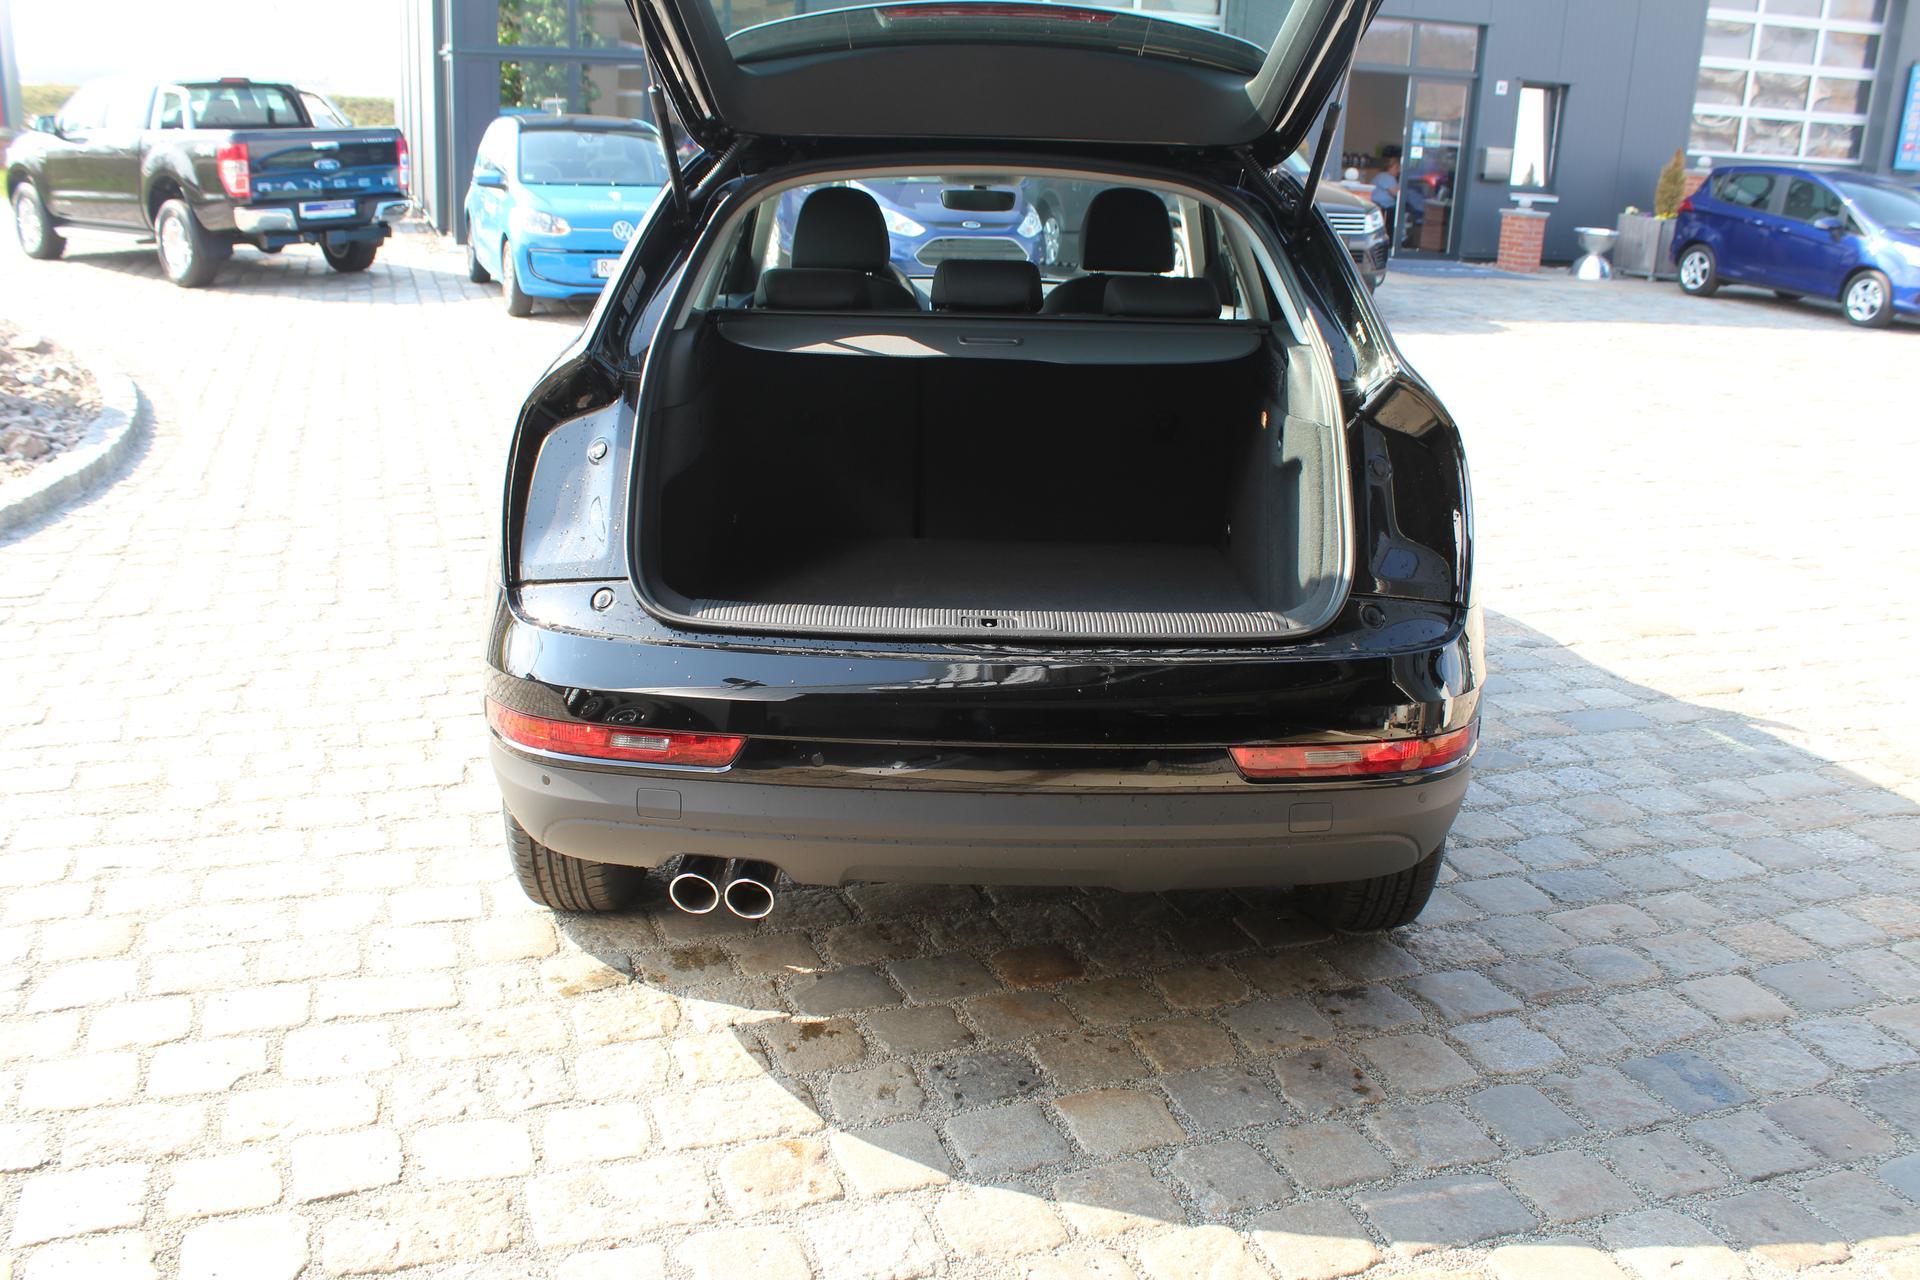 Audi Q3 1.4 TFSI 150 S-Tronic-Garantie 3 Jahre-Xenon-AHK schwenkbar ...